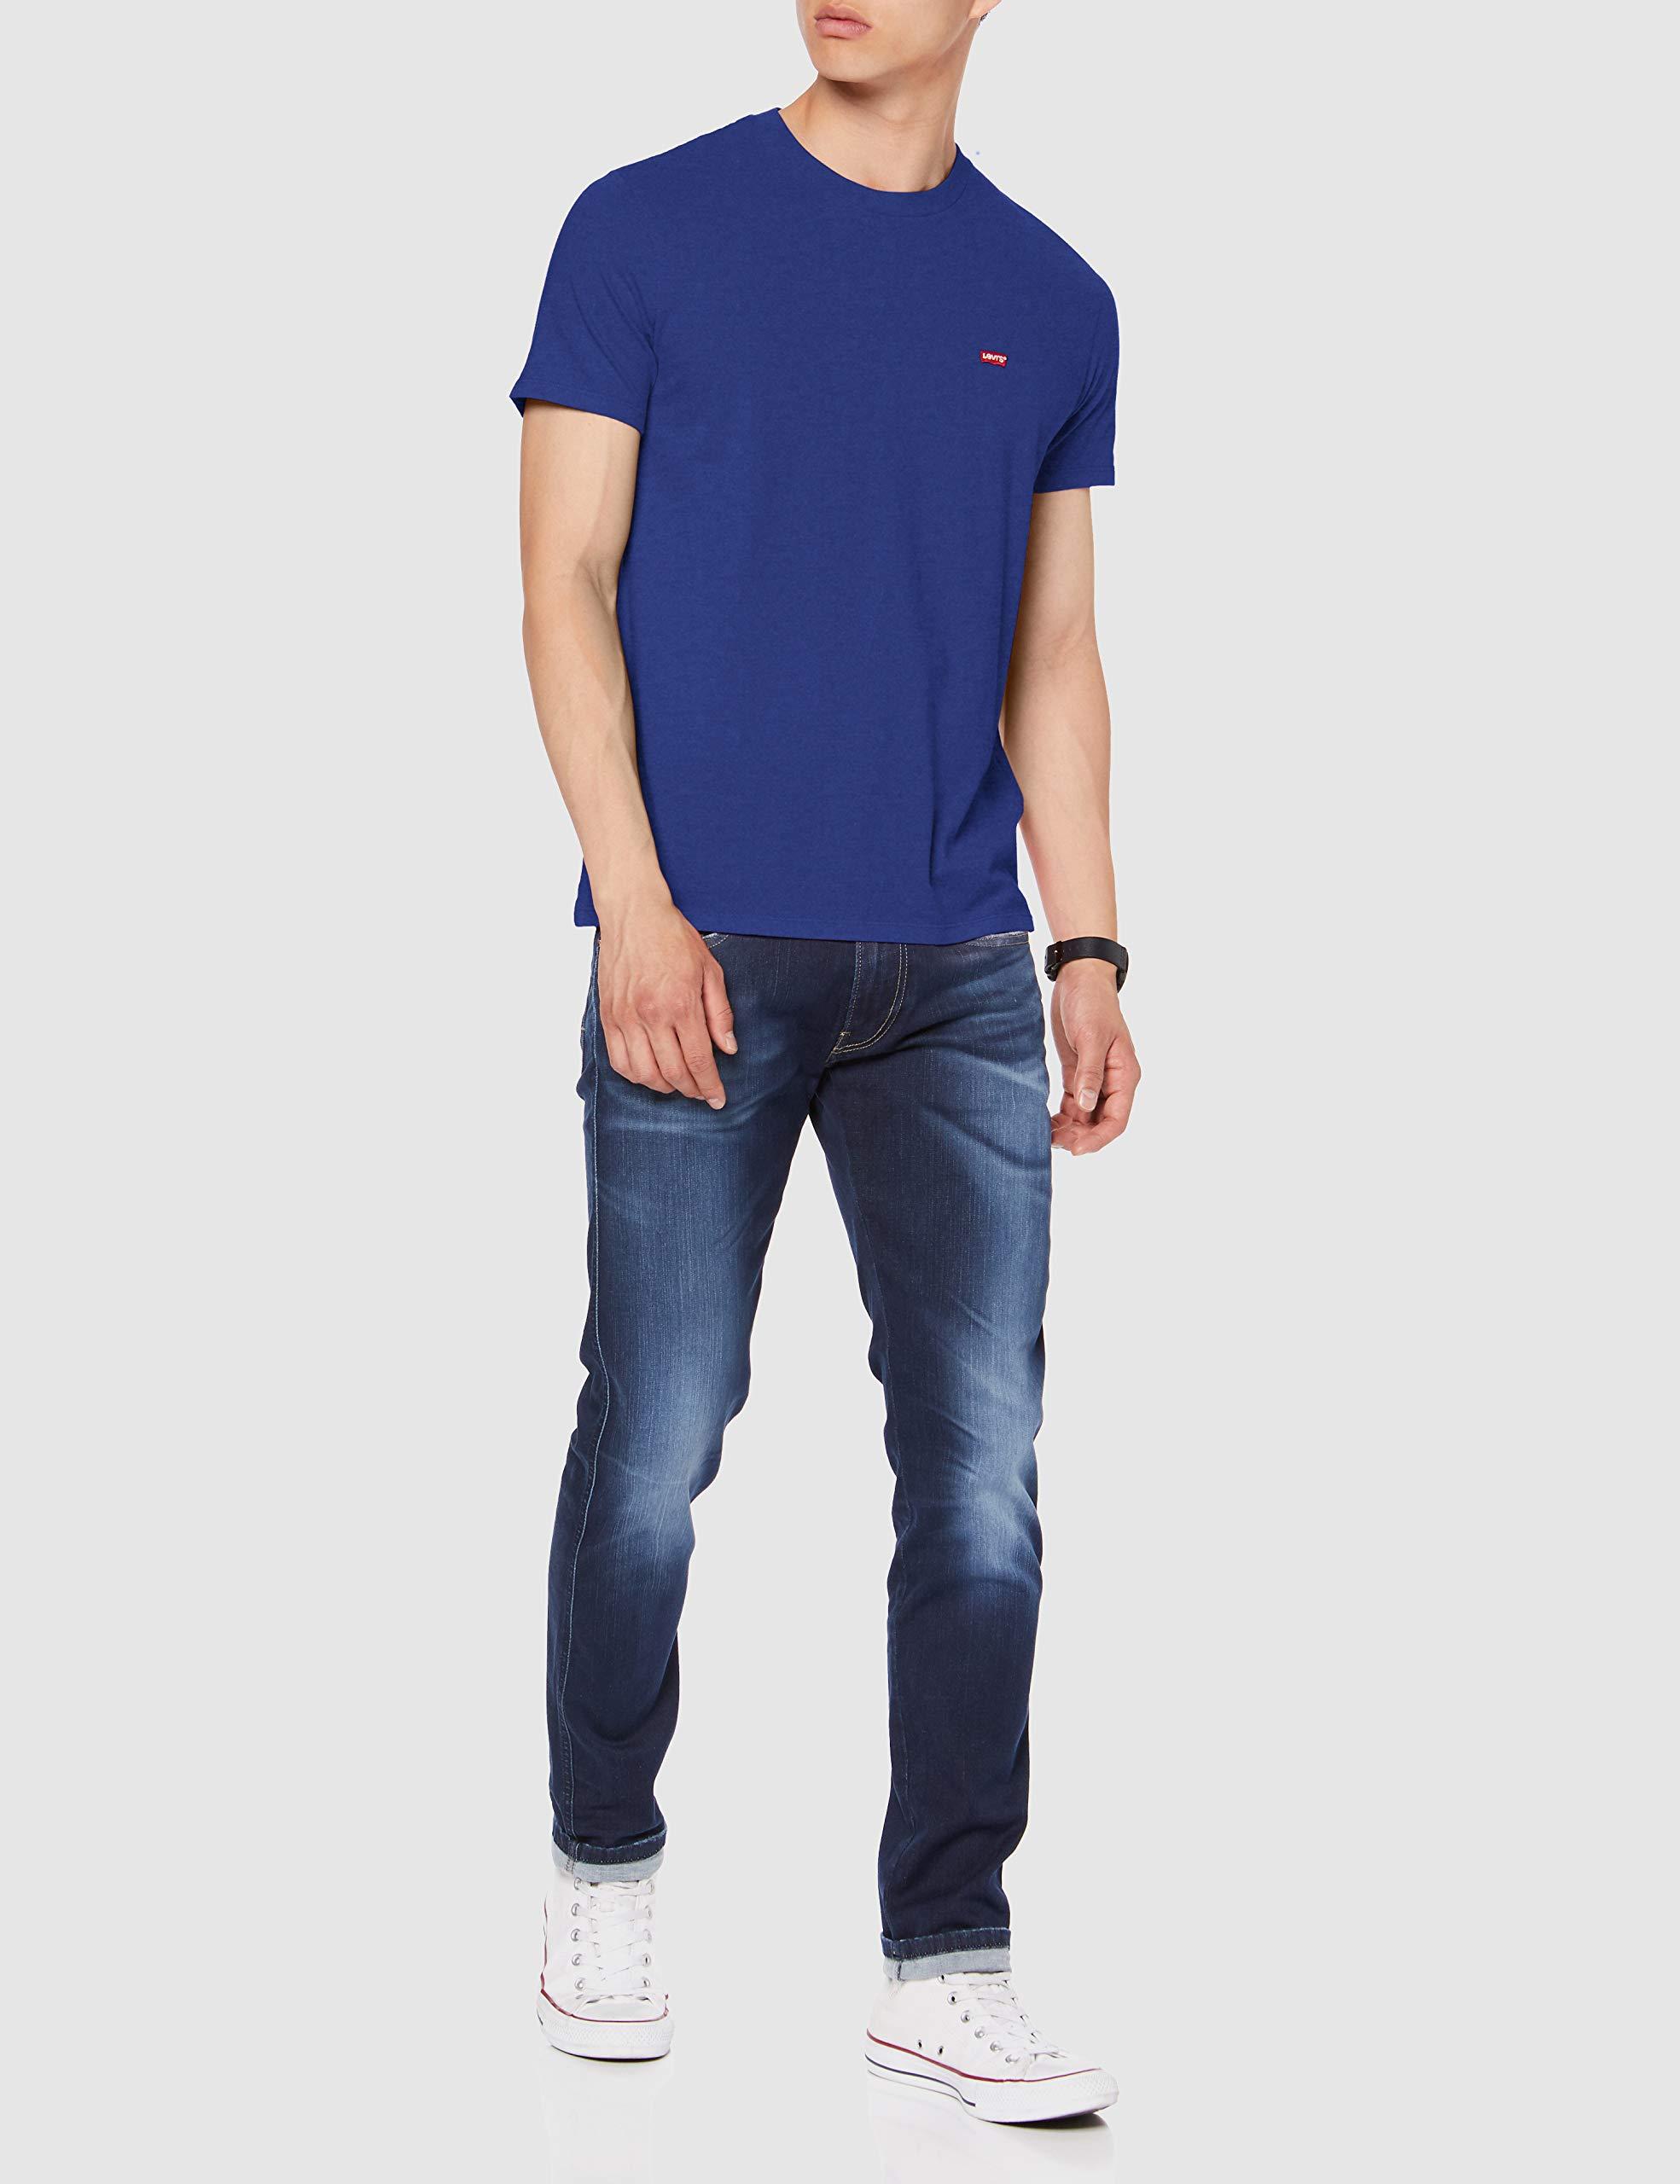 Levi's SS Original HM Tee T-Shirt Uomo 3 spesavip